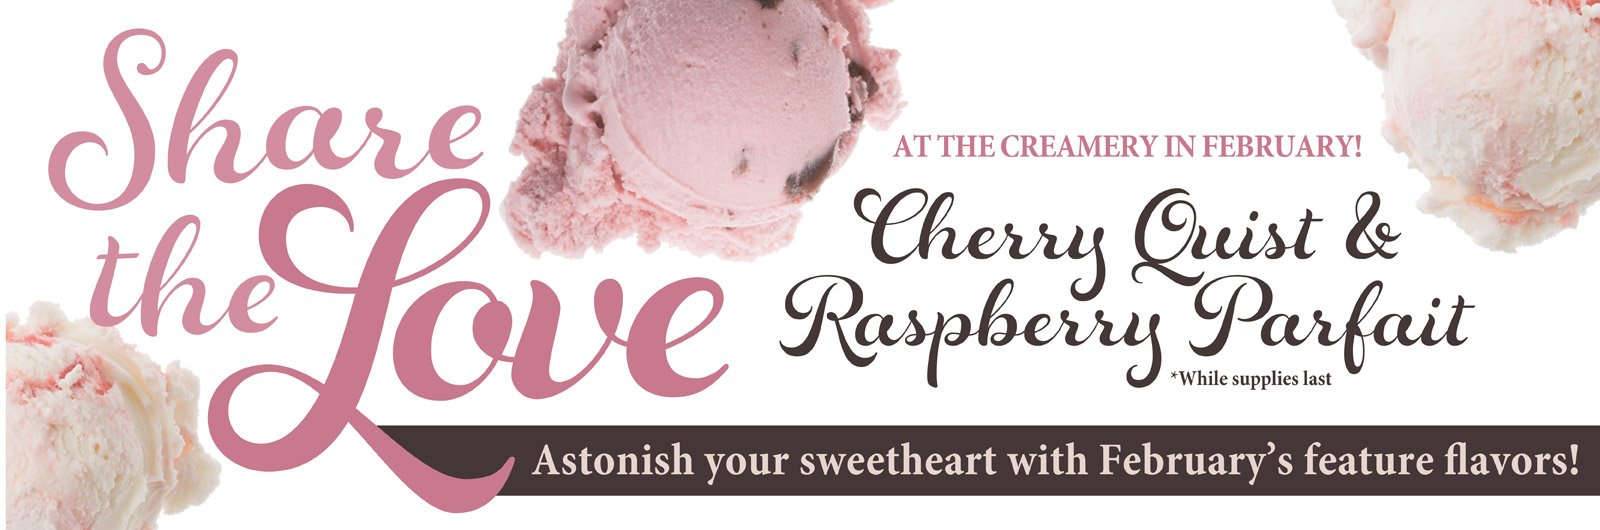 Order Ice Cream - Cherry Quist and Raspberry Parfait